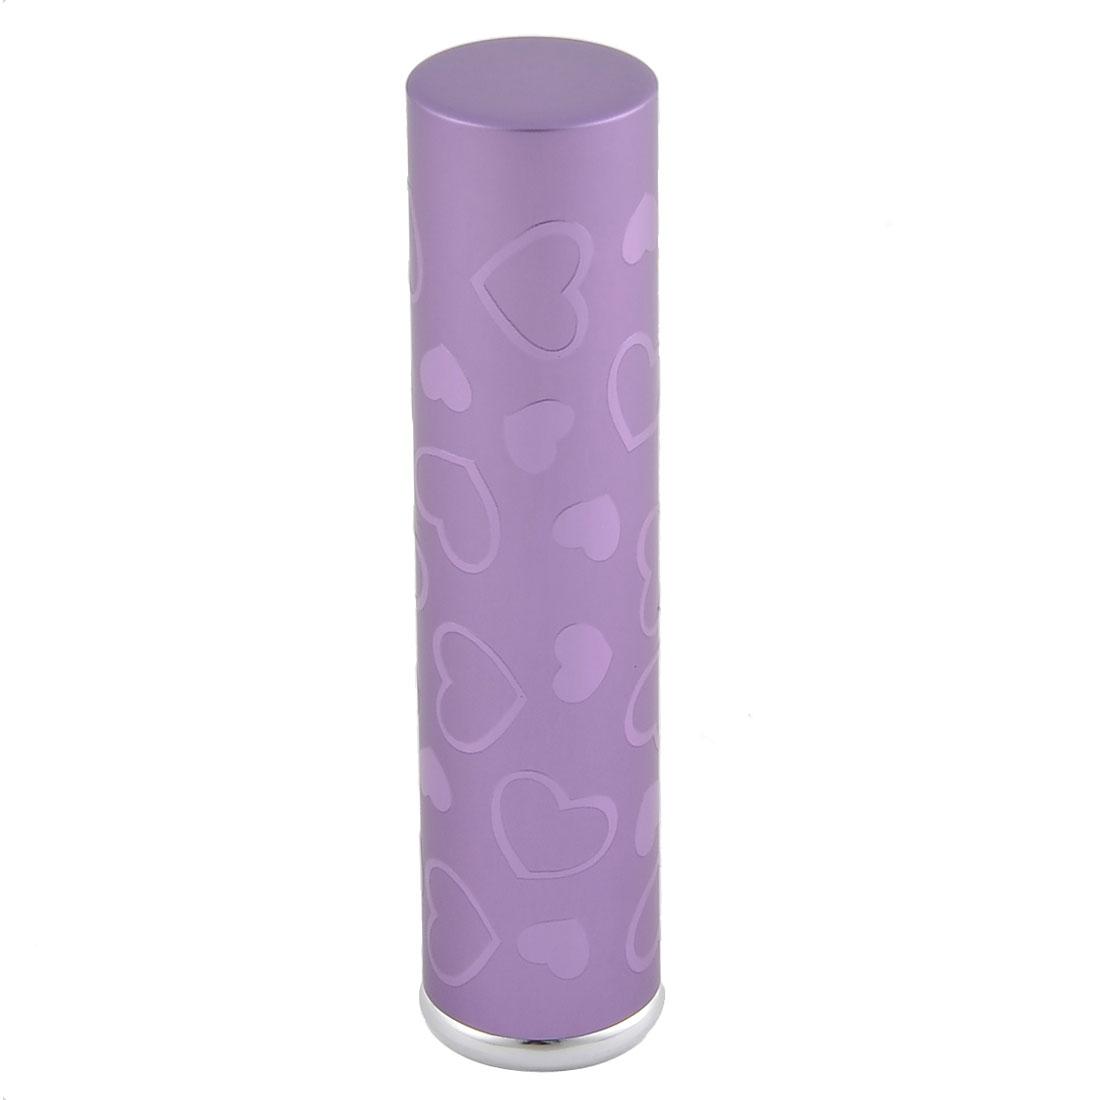 7mL Travel Portable Love Heart Mini Refillable Perfume Spray Bottle Purple - image 3 de 3